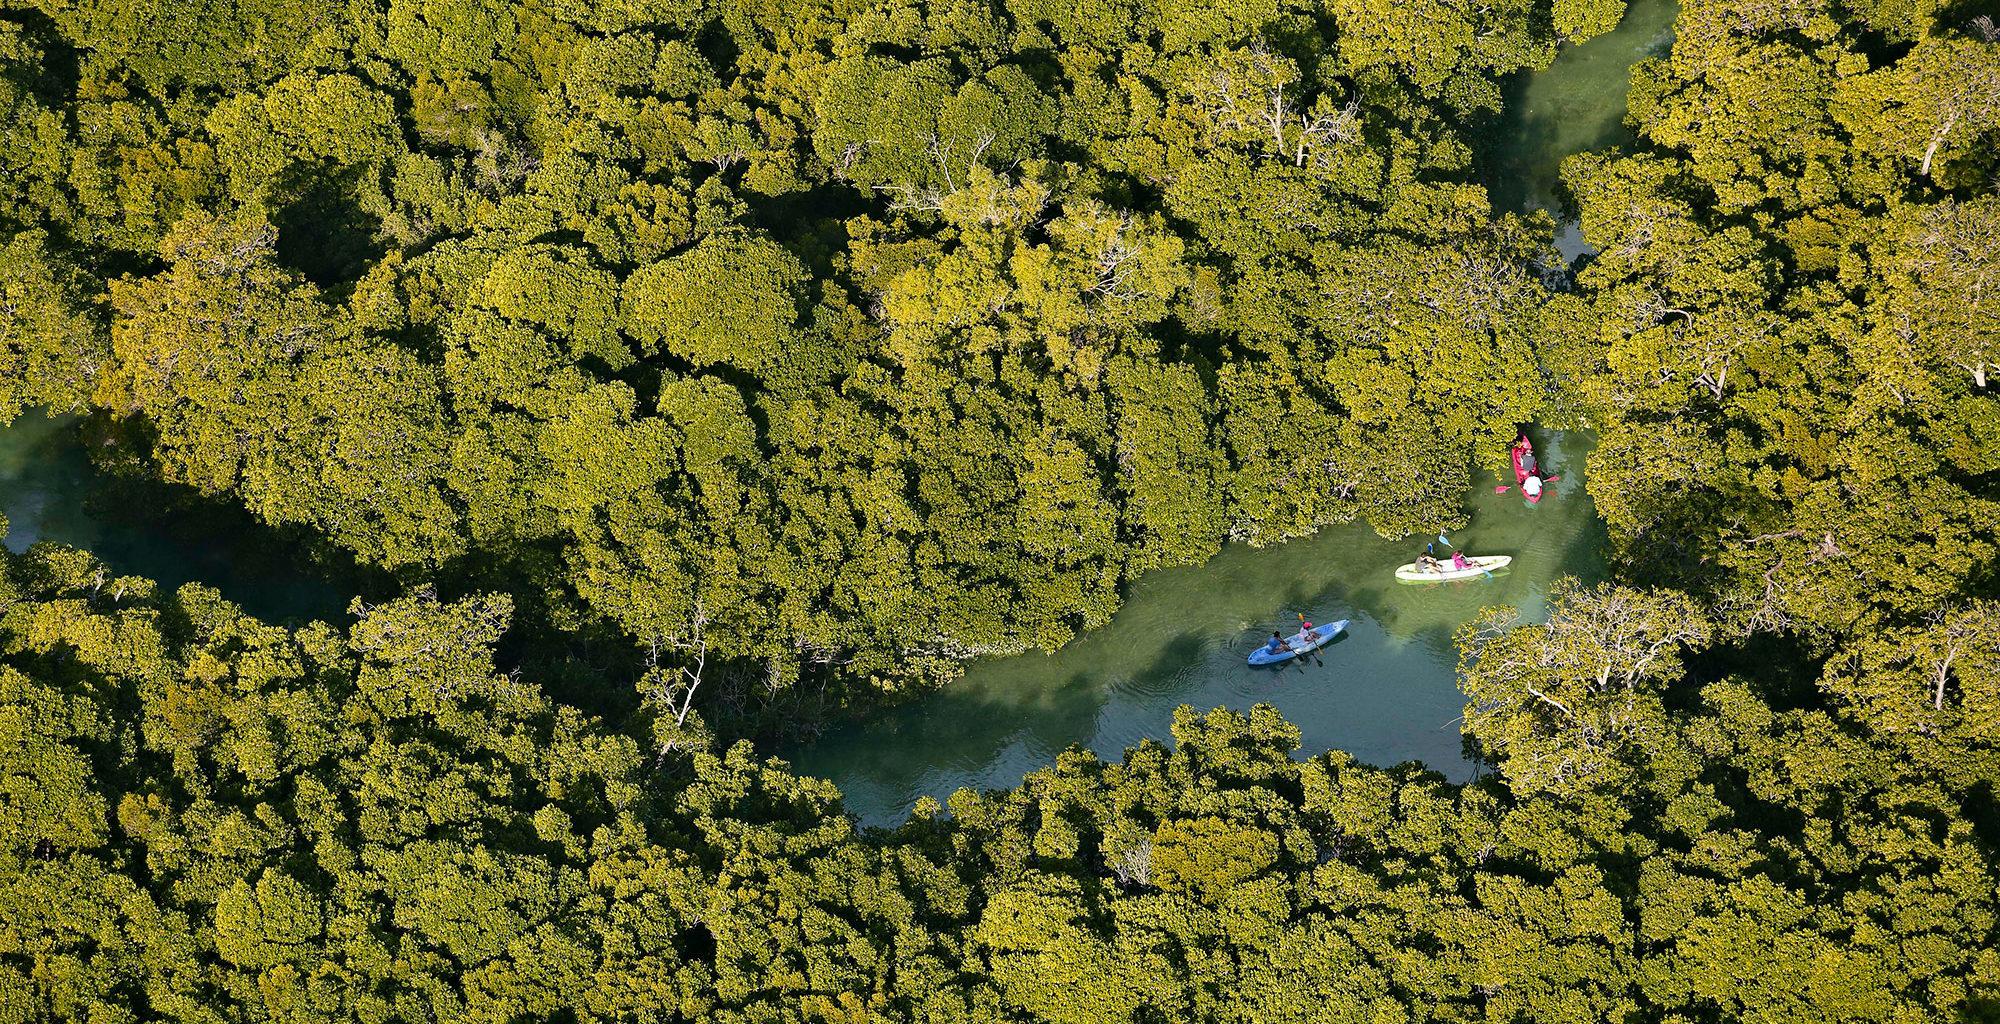 Mozambique-Quirimbas-Archipelago-Kayaking-Aerial